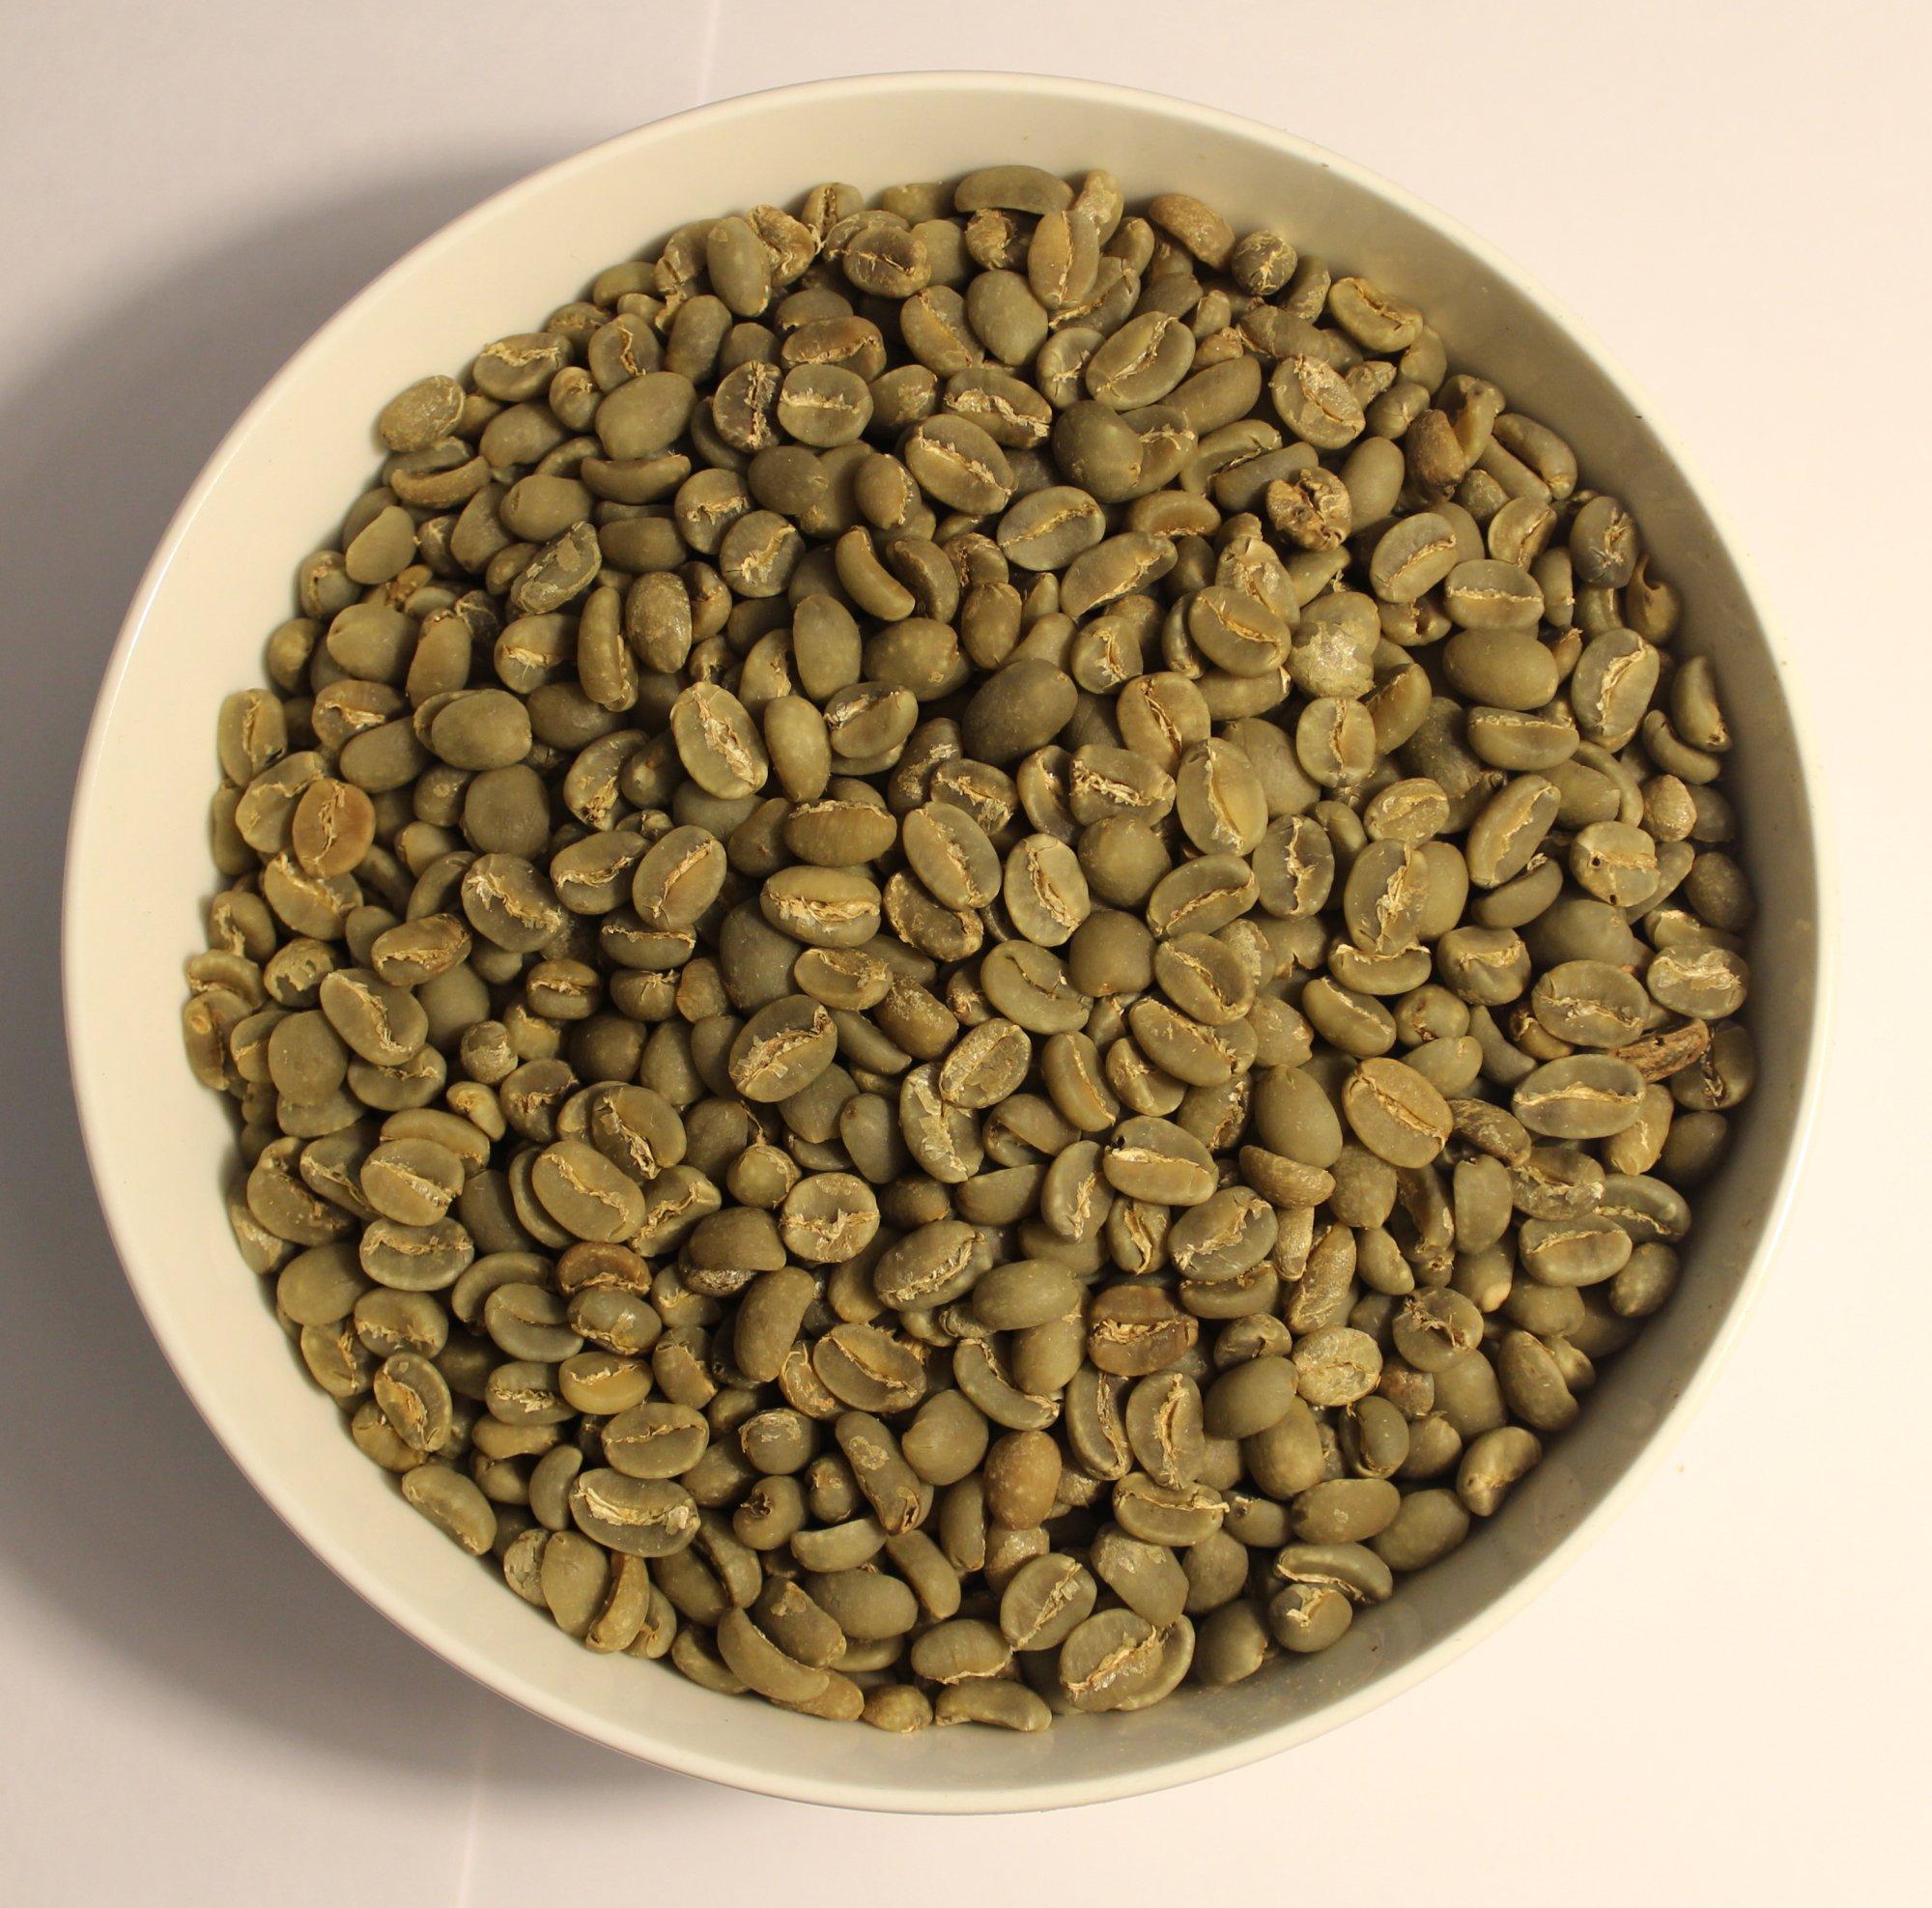 Celebes Kalossi (Sulawesi) Toraja, Sapan Minanga, Grade 1 - Green (Raw) Coffee Beans (18 Pounds)